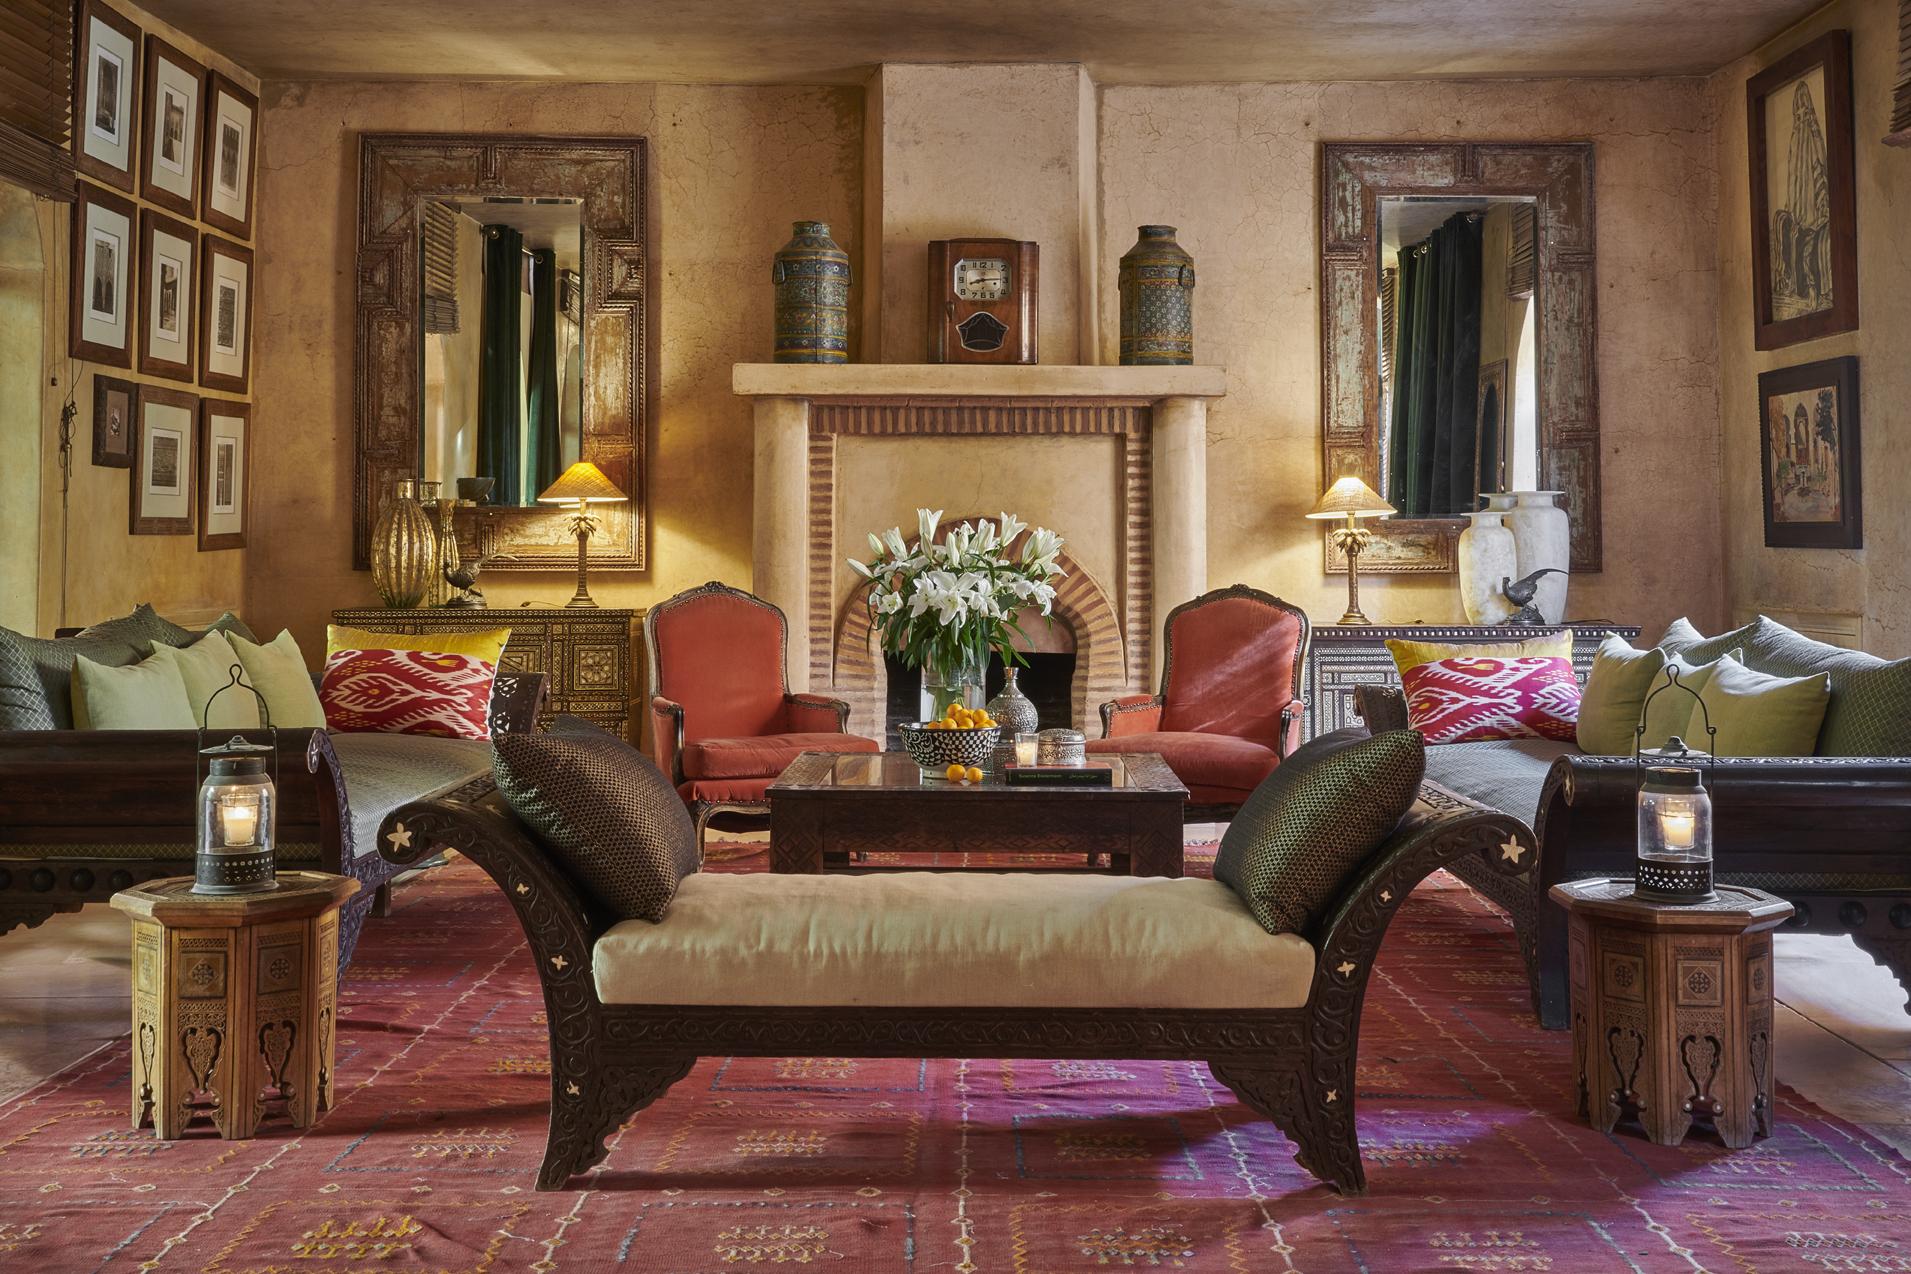 meryanne loum martin-Marrakech Rizzoli6339 usa.jpg